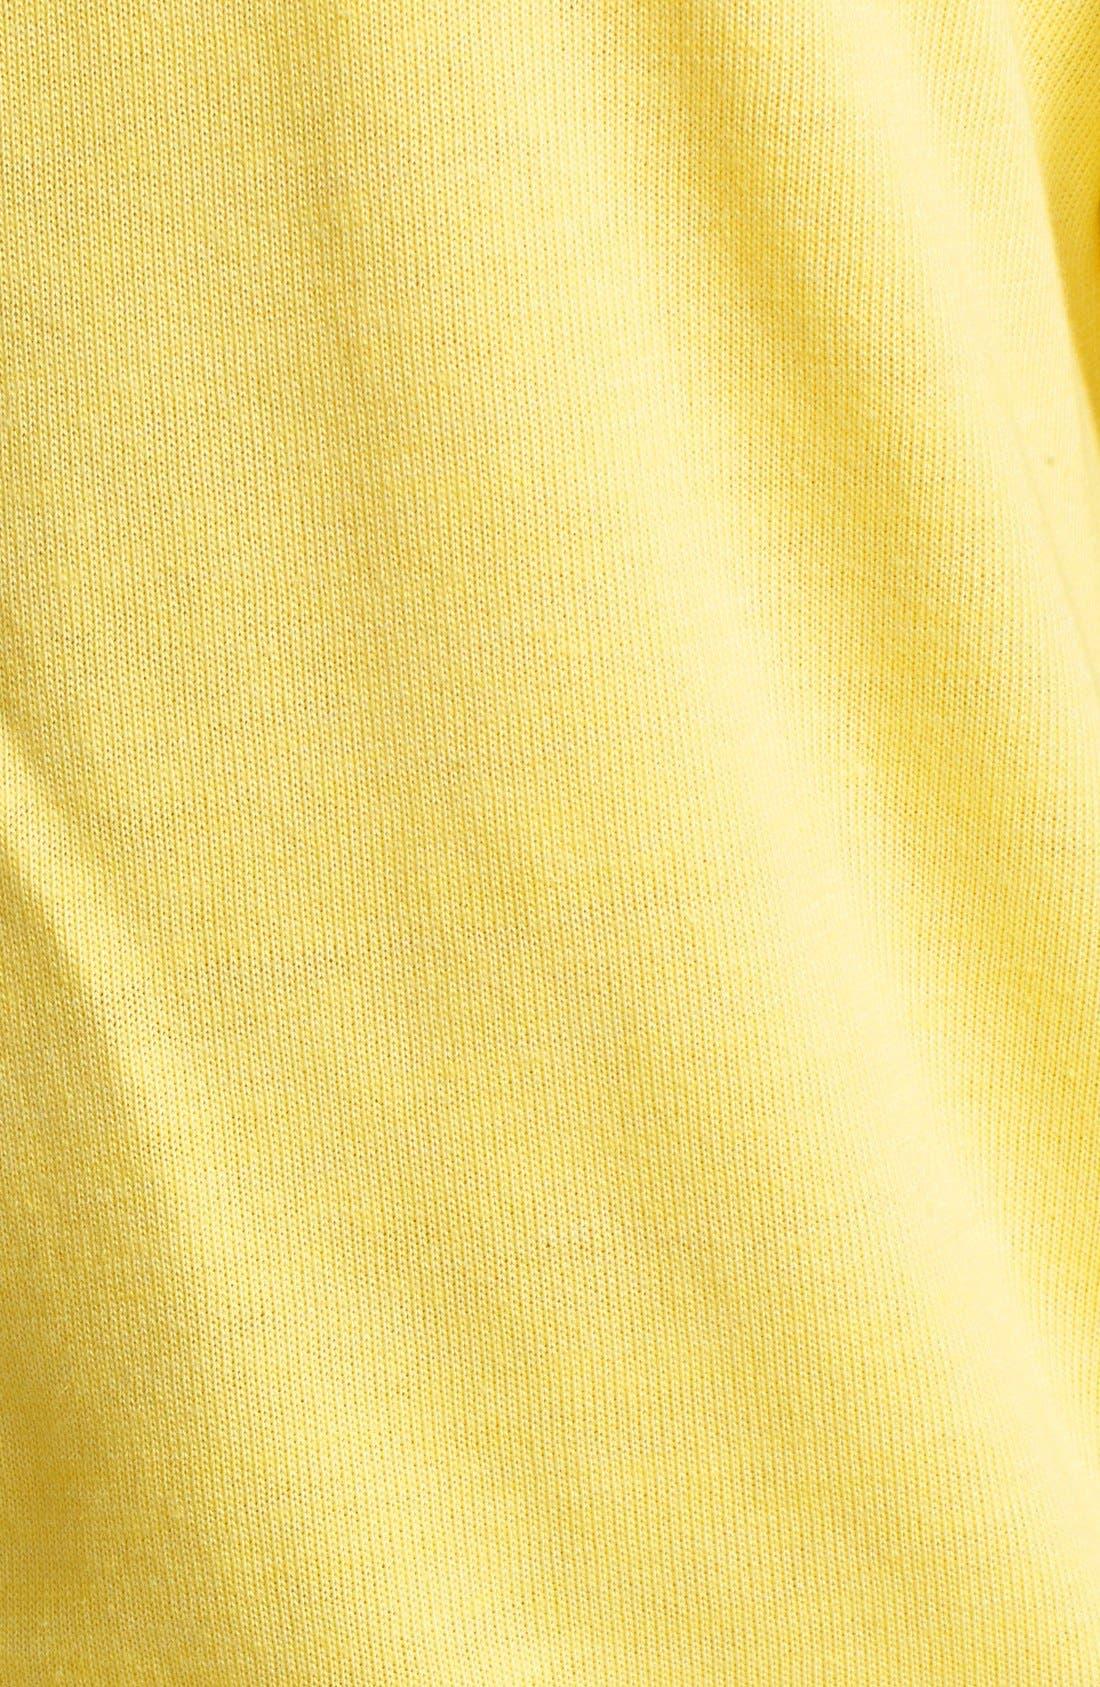 Alternate Image 3  - Sundry Pullover Hoodie